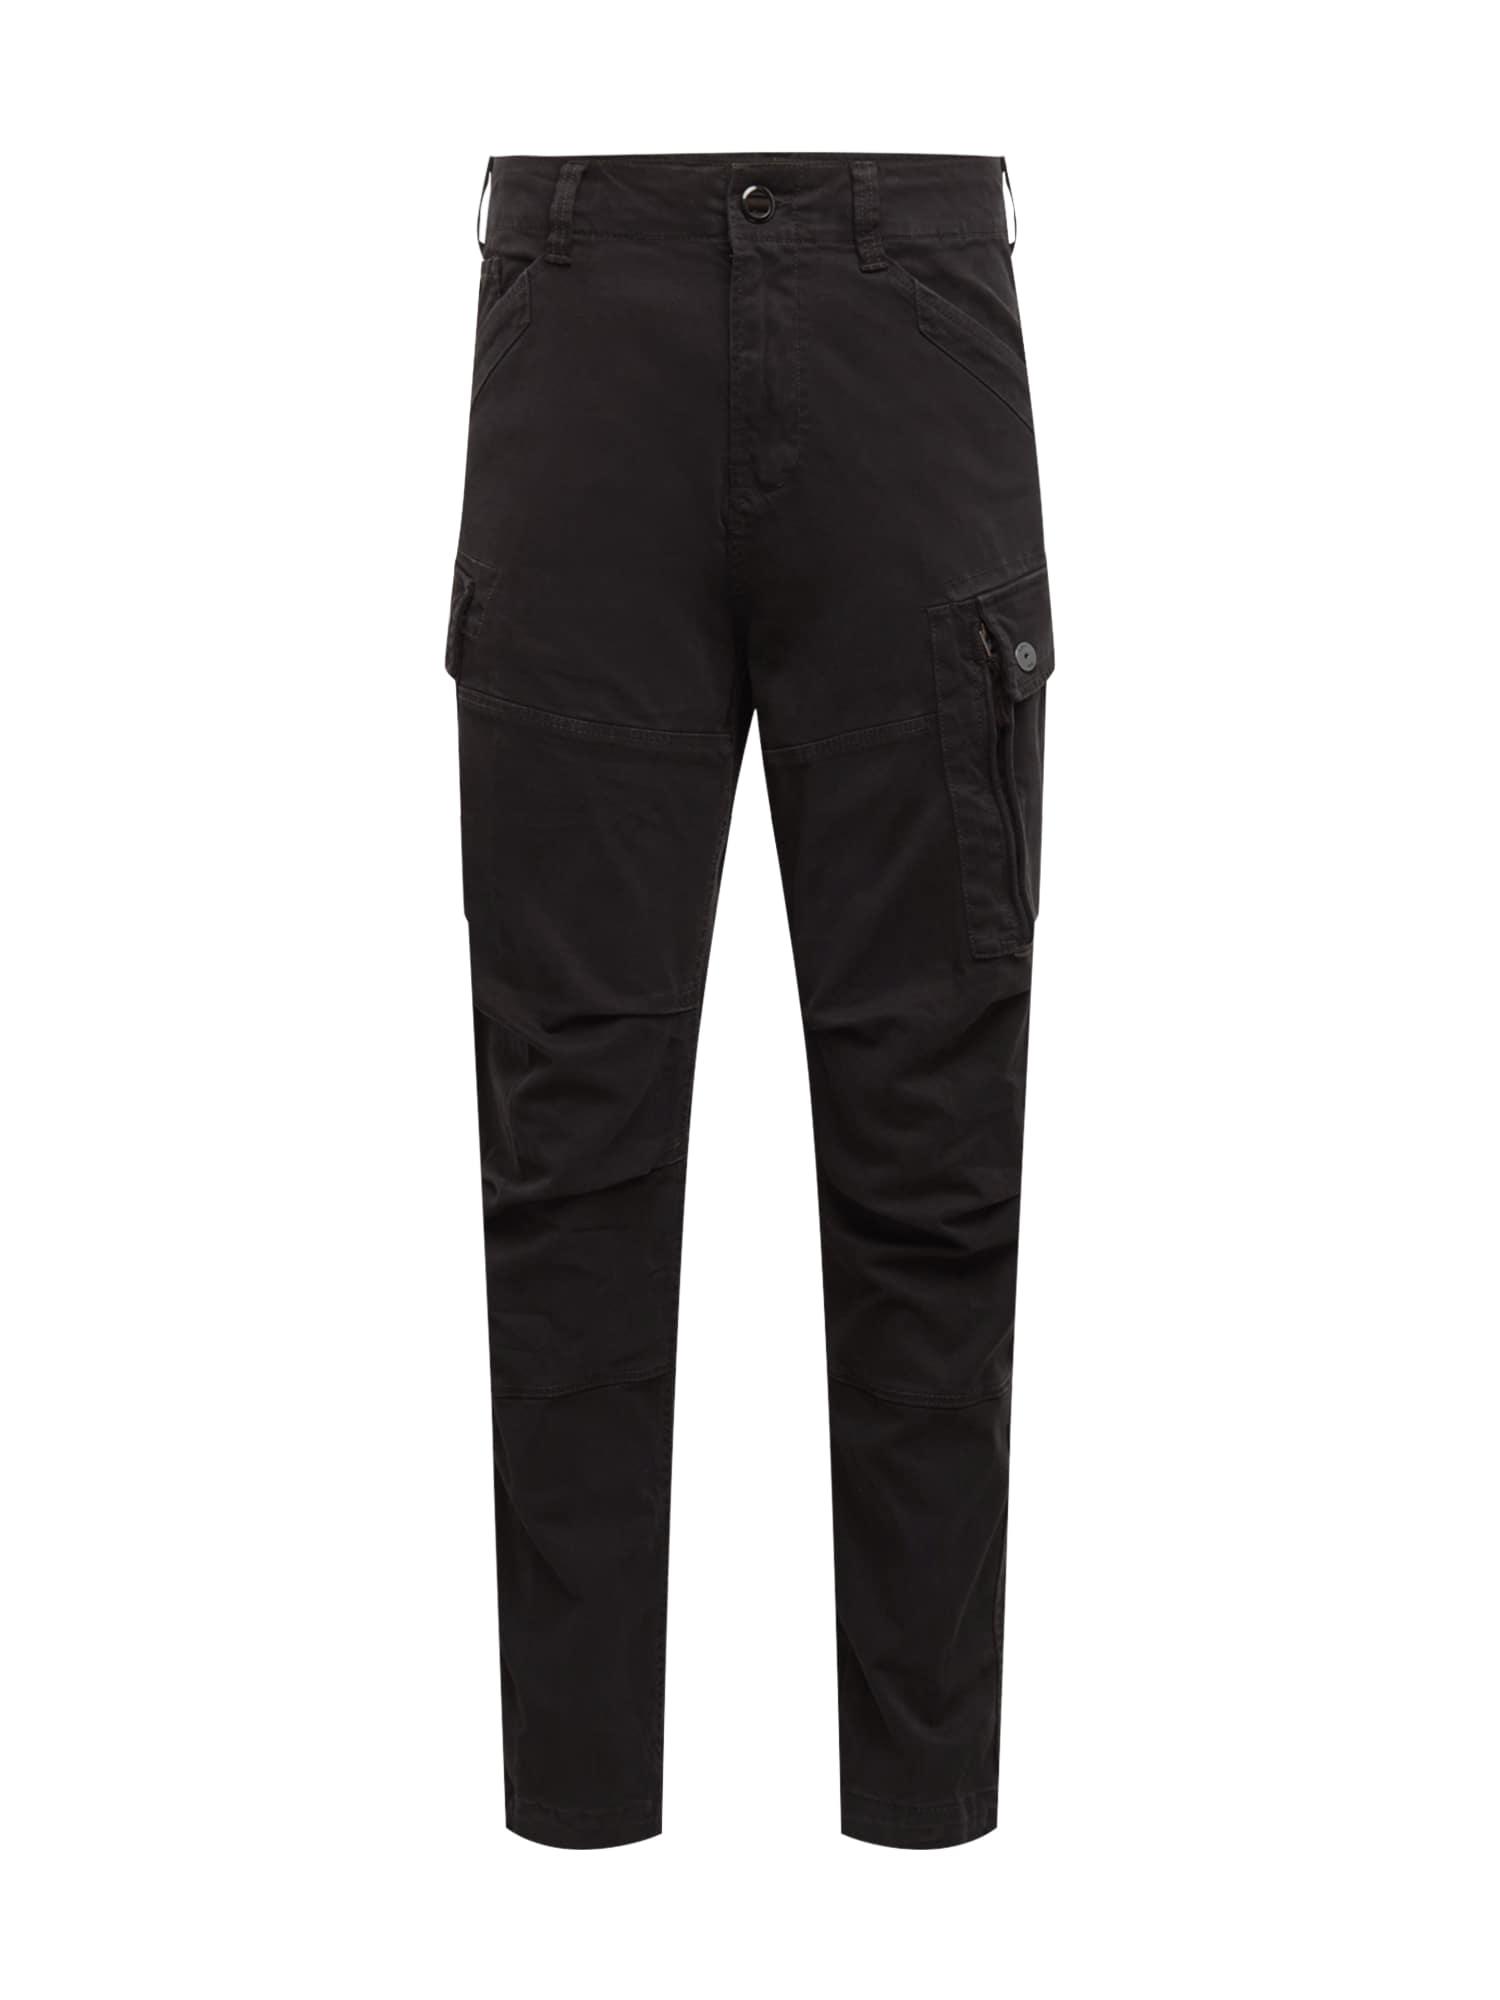 G-Star RAW Laisvo stiliaus kelnės